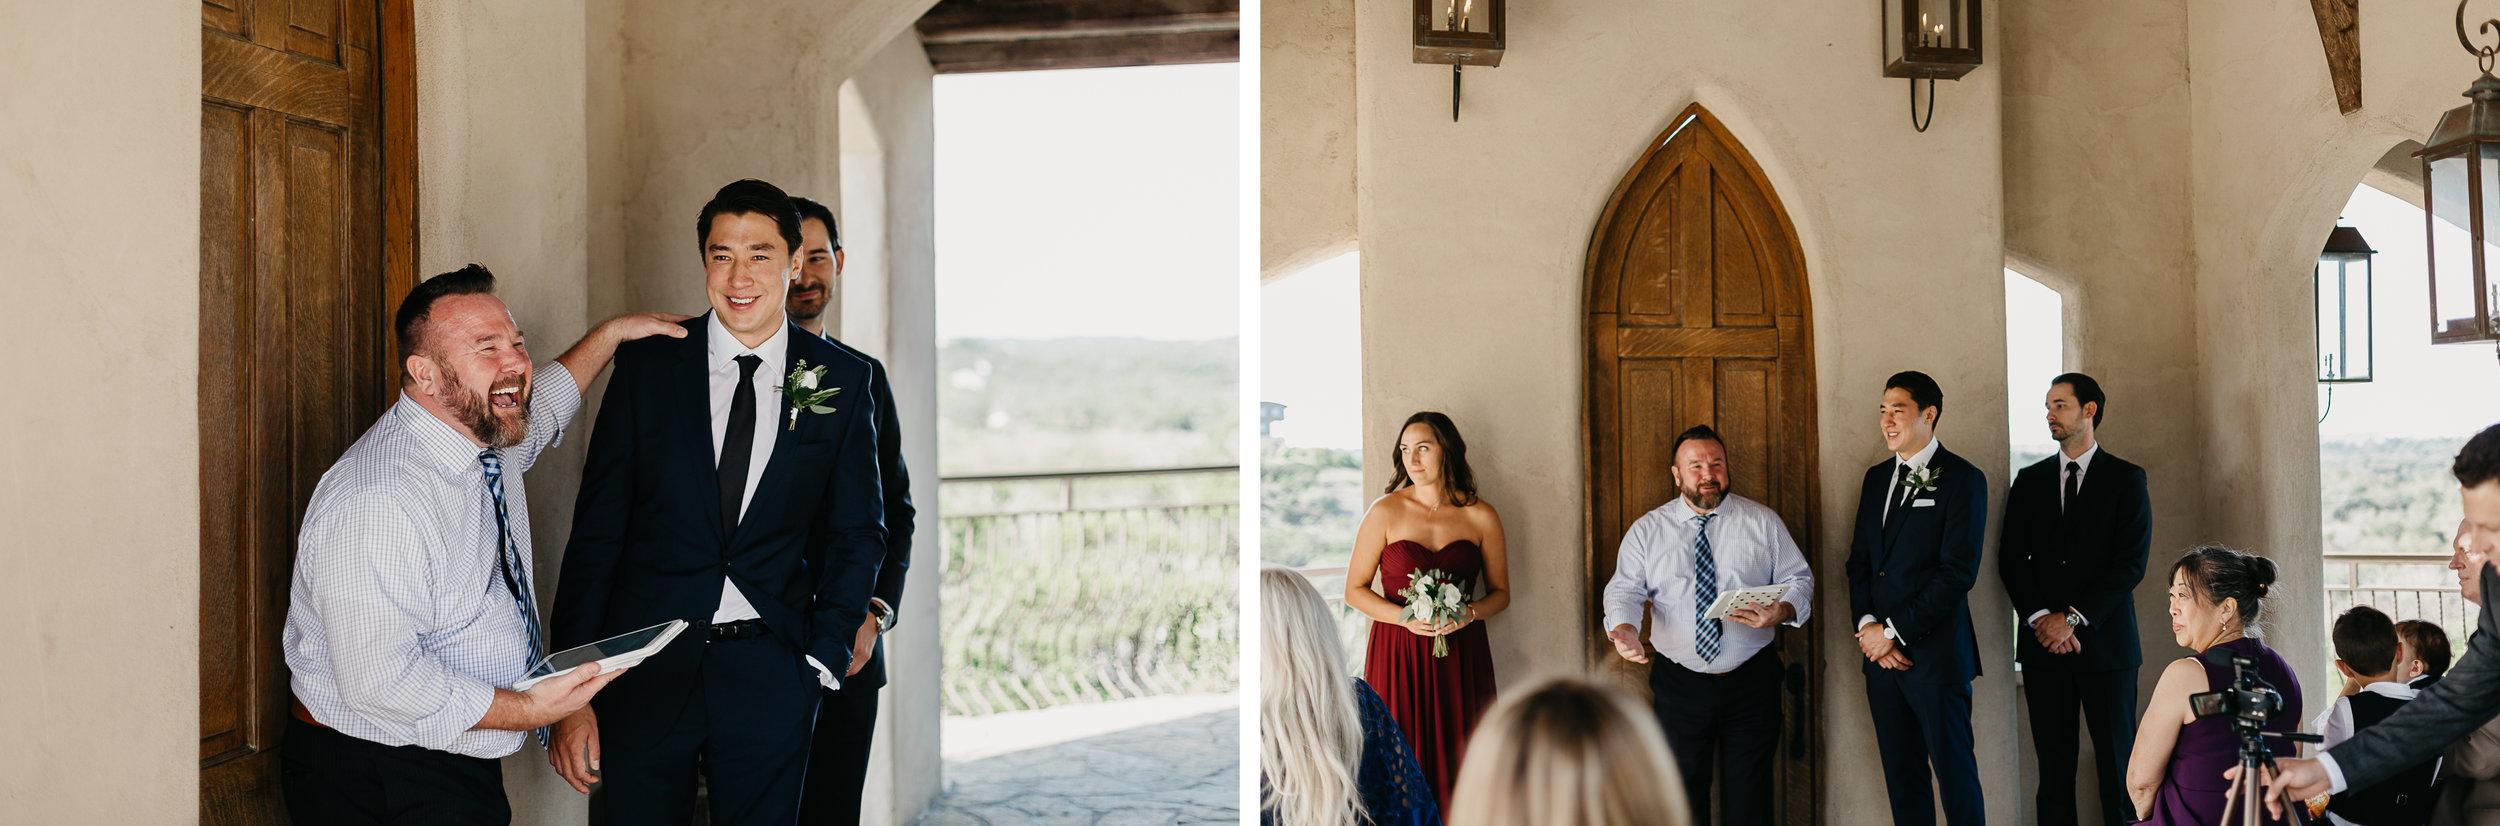 austin wedding photographer 4.jpg